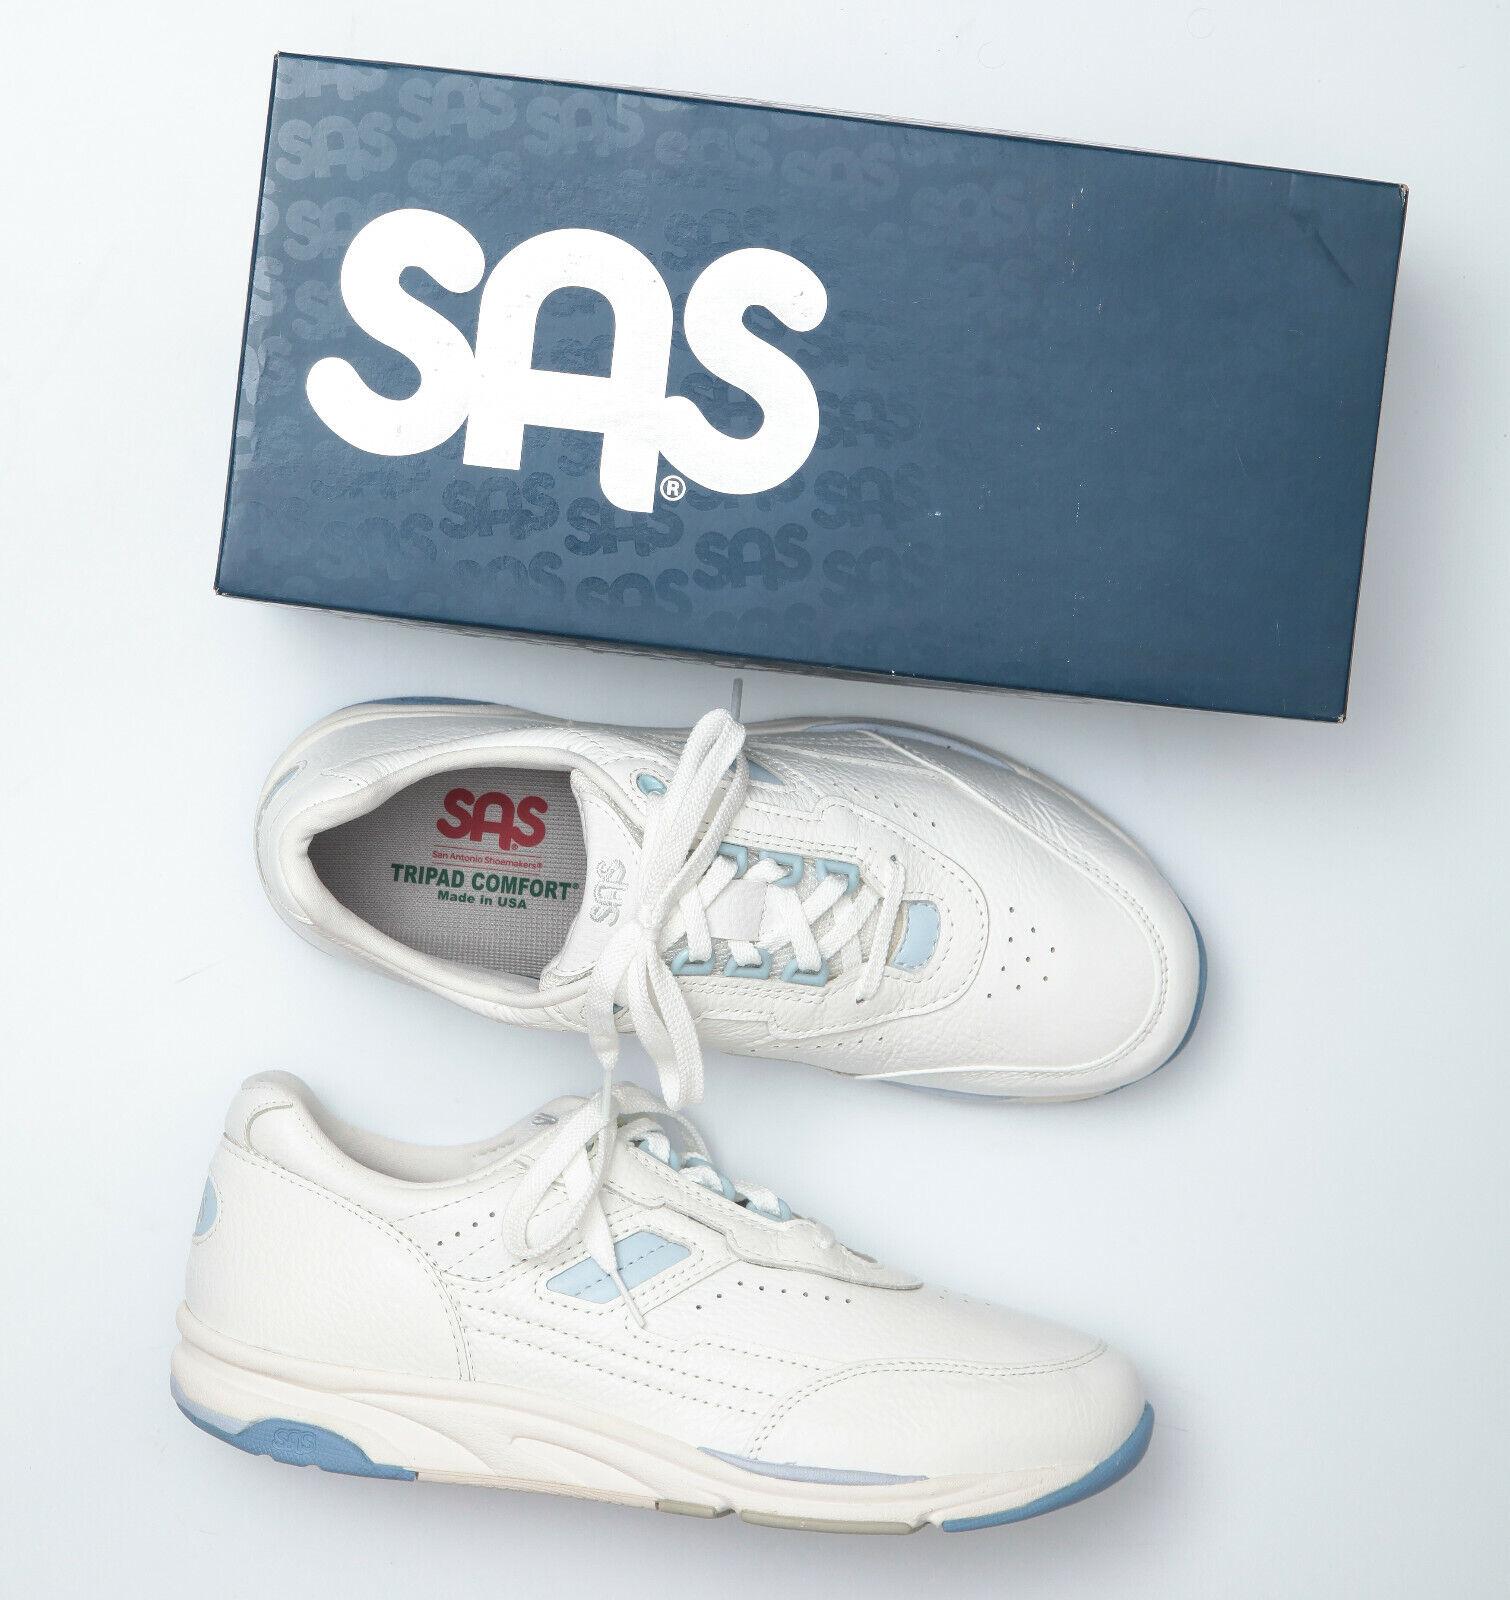 SAS Tour bianca Leather Walking Comfort scarpe da  ginnastica - Wouomo 10 W  connotazione di lusso low-key